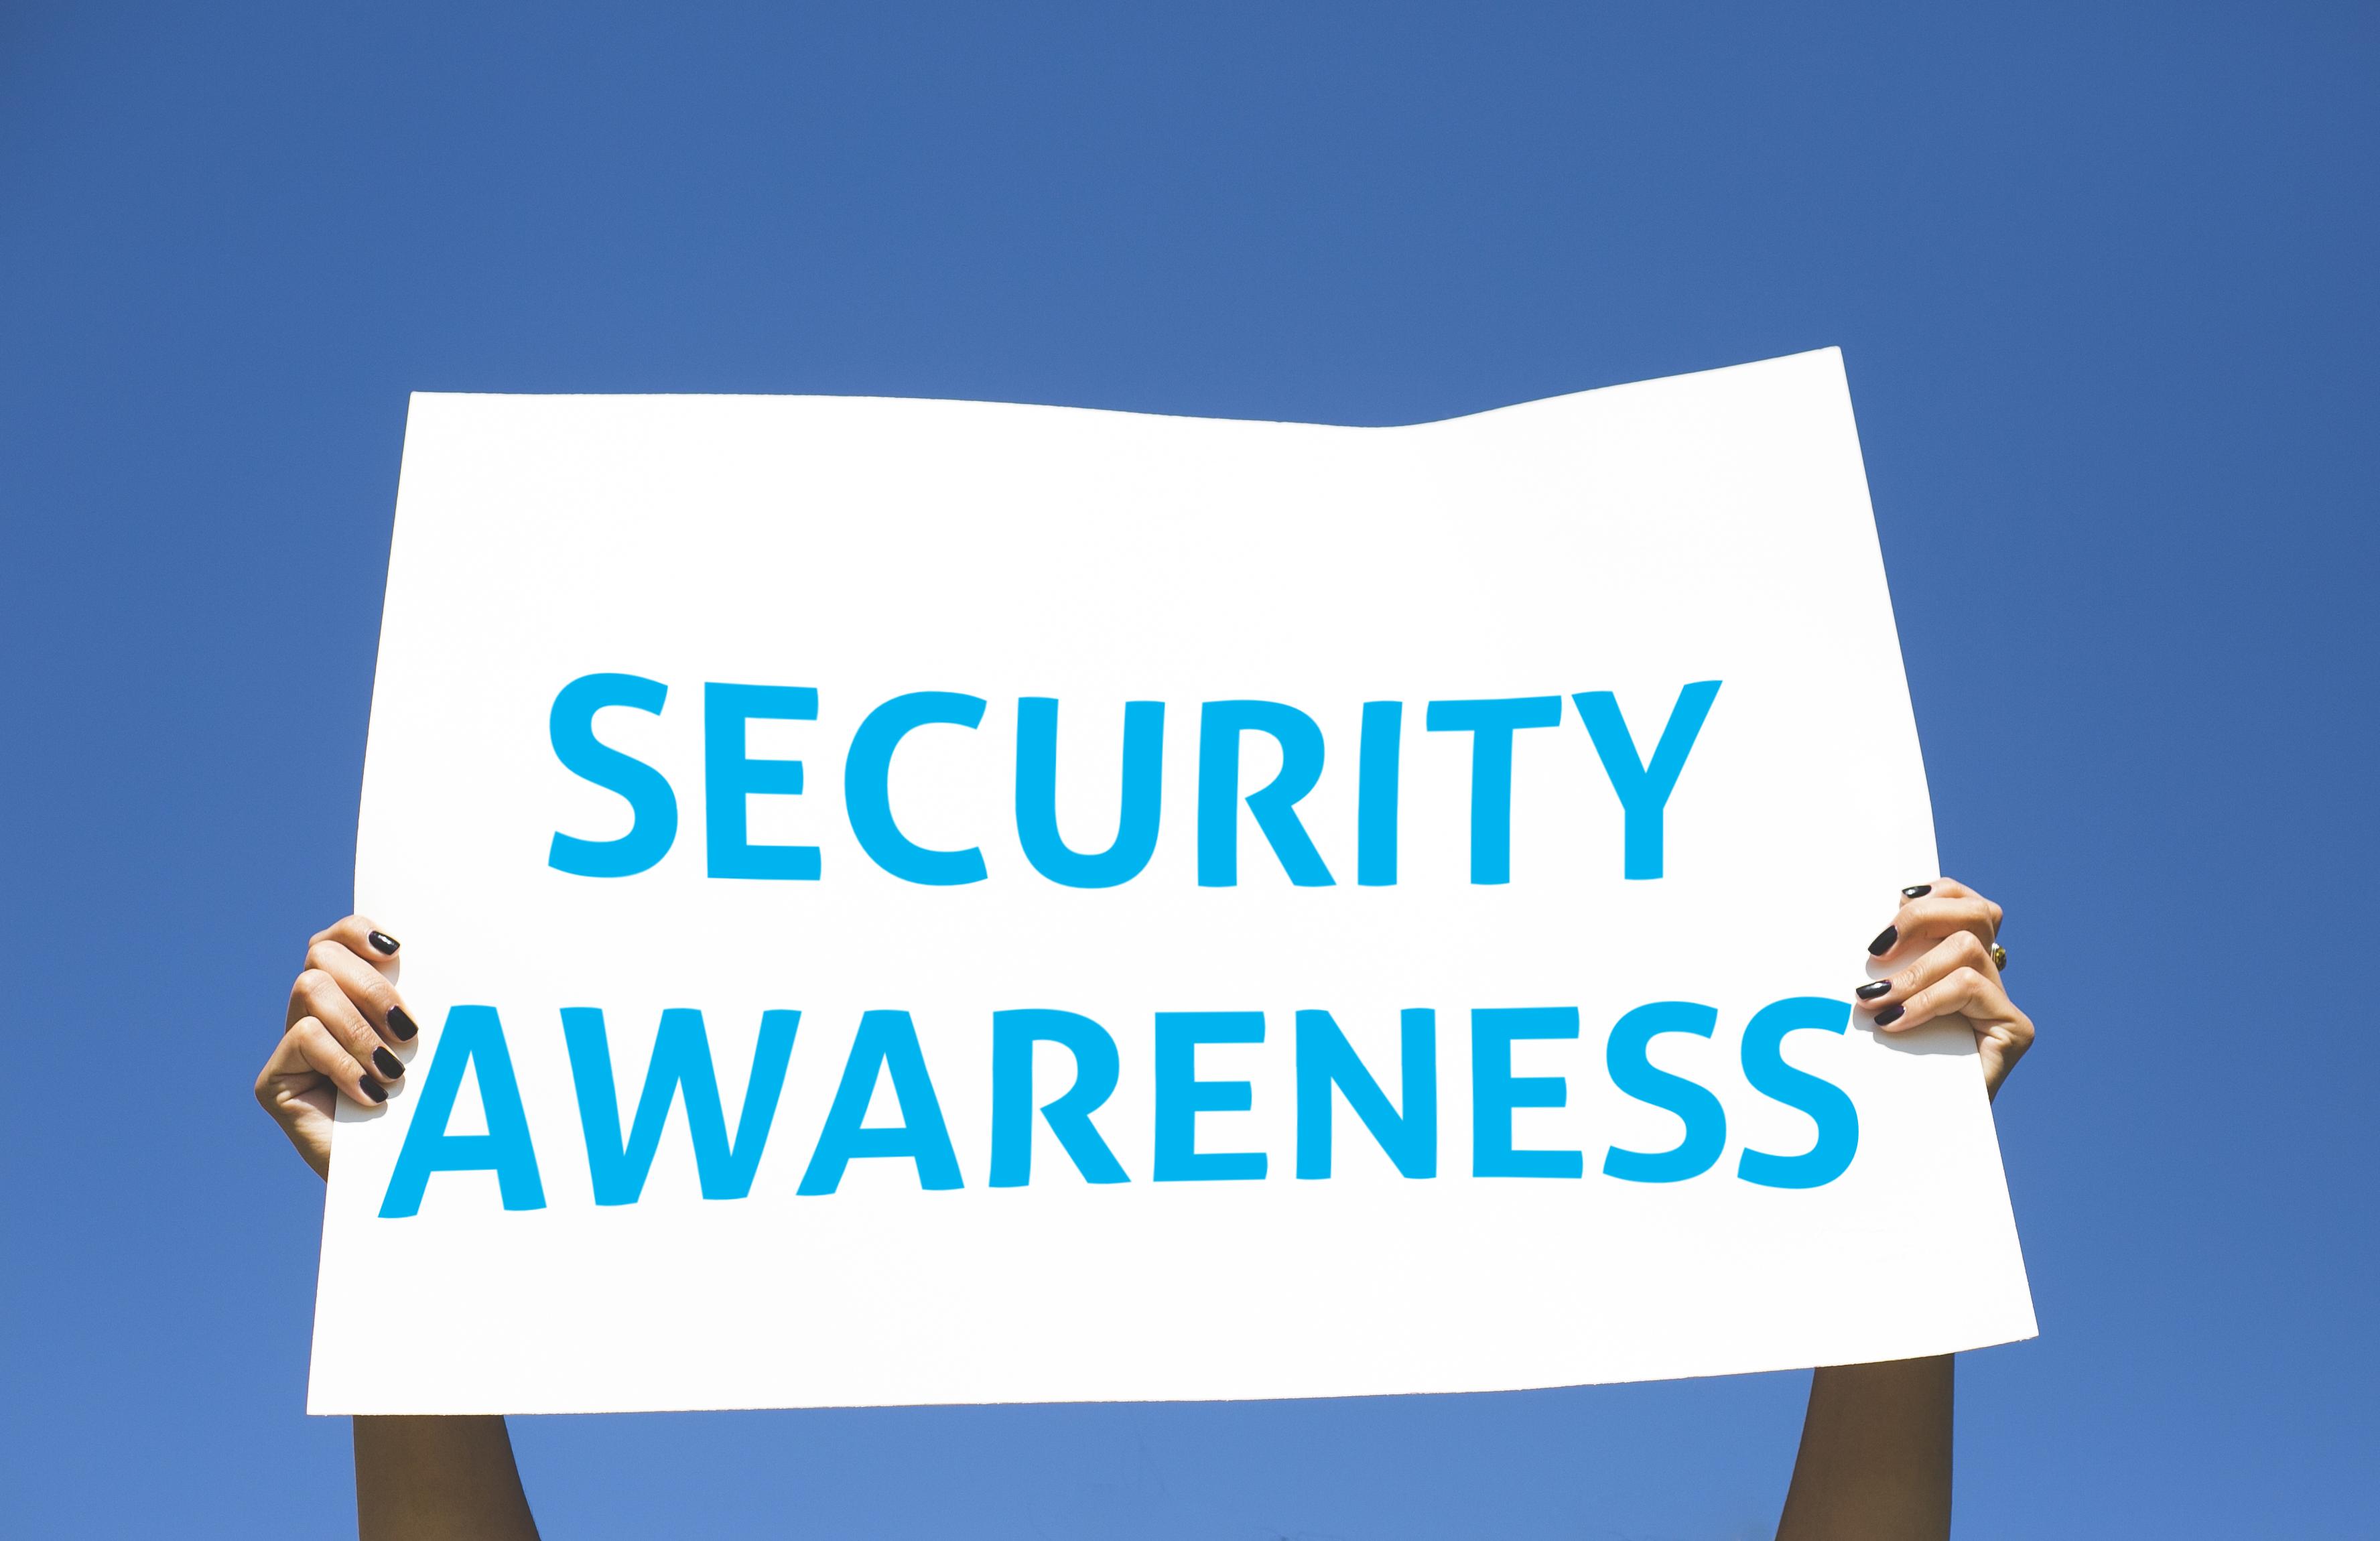 Security awareness in perpetuity